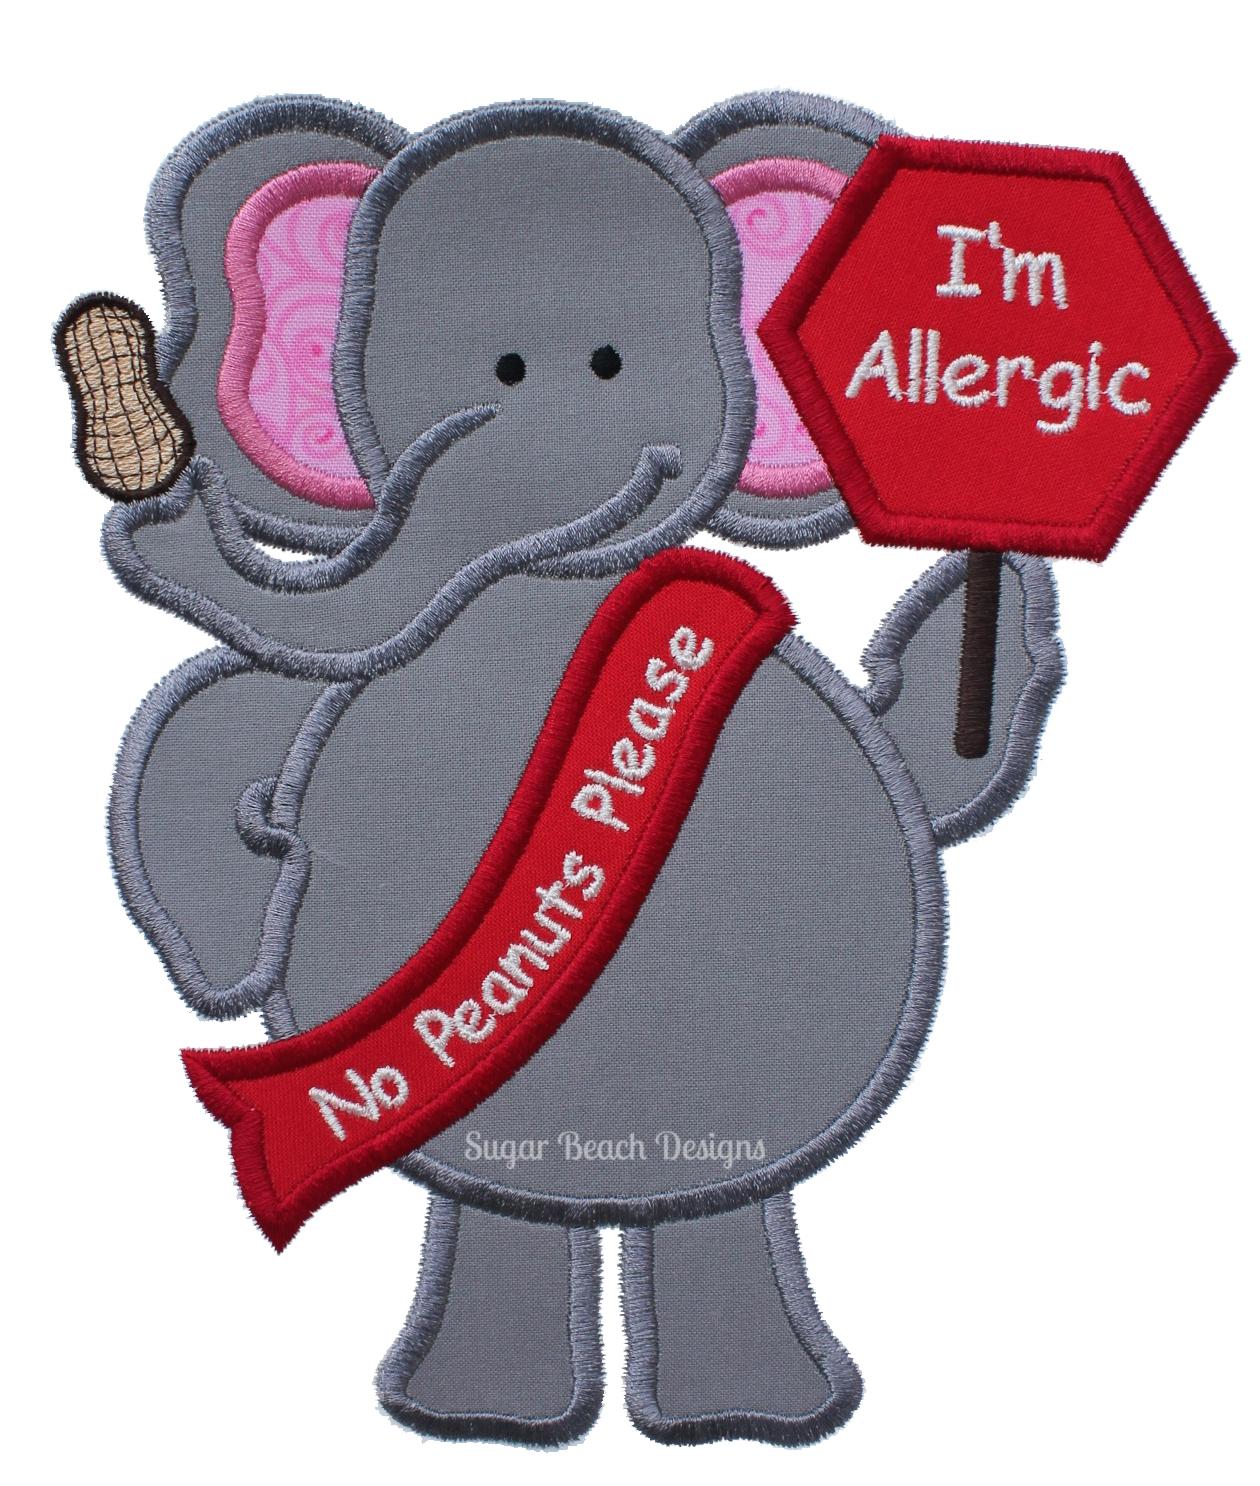 Elephant Allergic to Peanuts-Peanuts Elephant Allergy Health